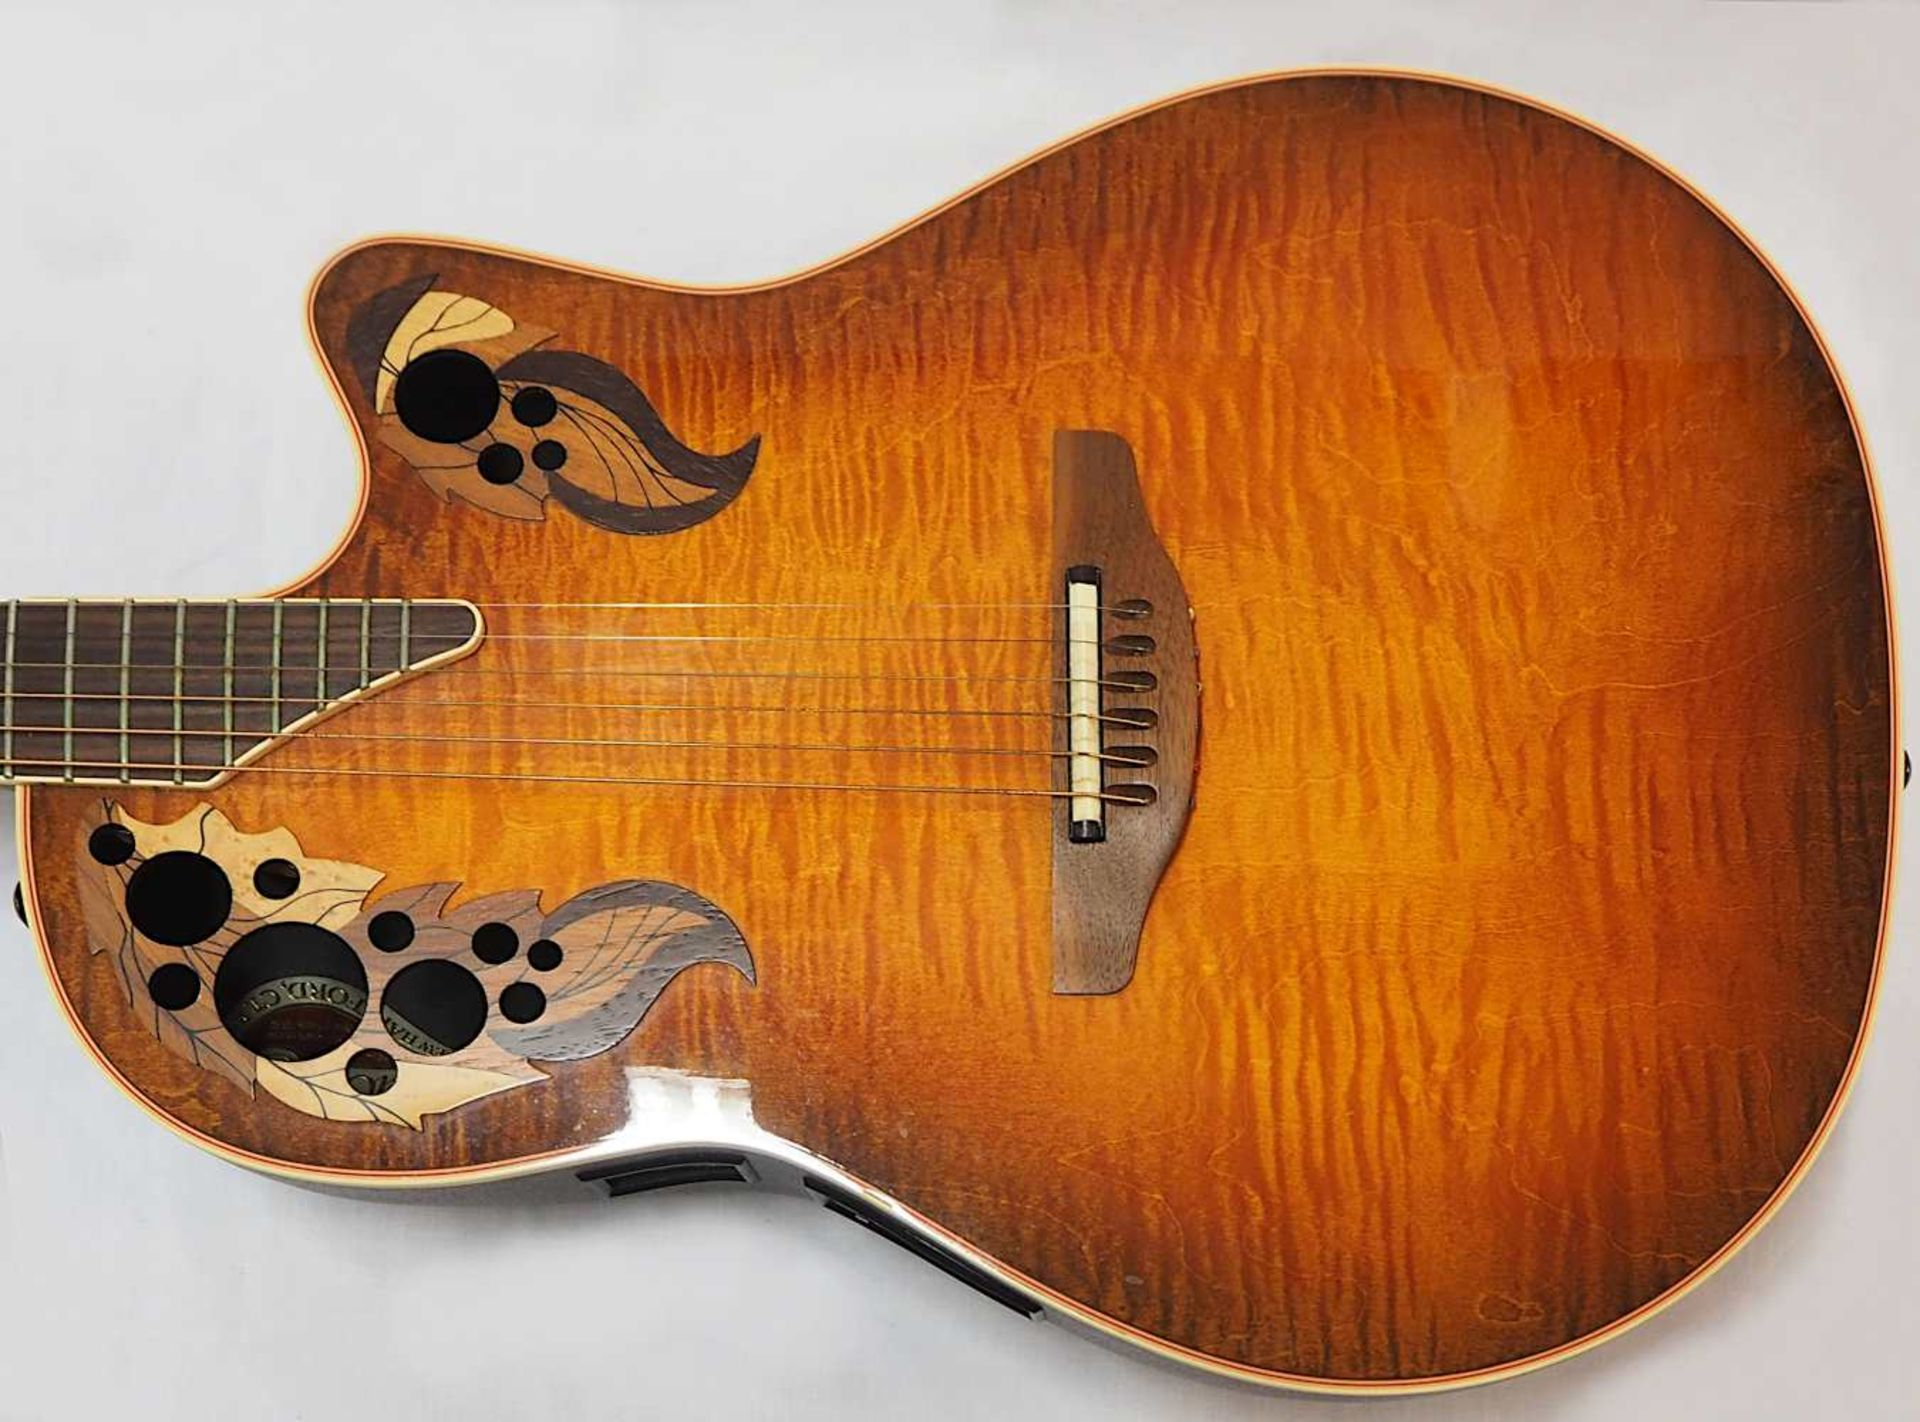 "1 Akustikgitarre OVATION ""Nr. 493 Collector's Series'98, New Hartford, CT./USA"" Holz m - Bild 4 aus 5"